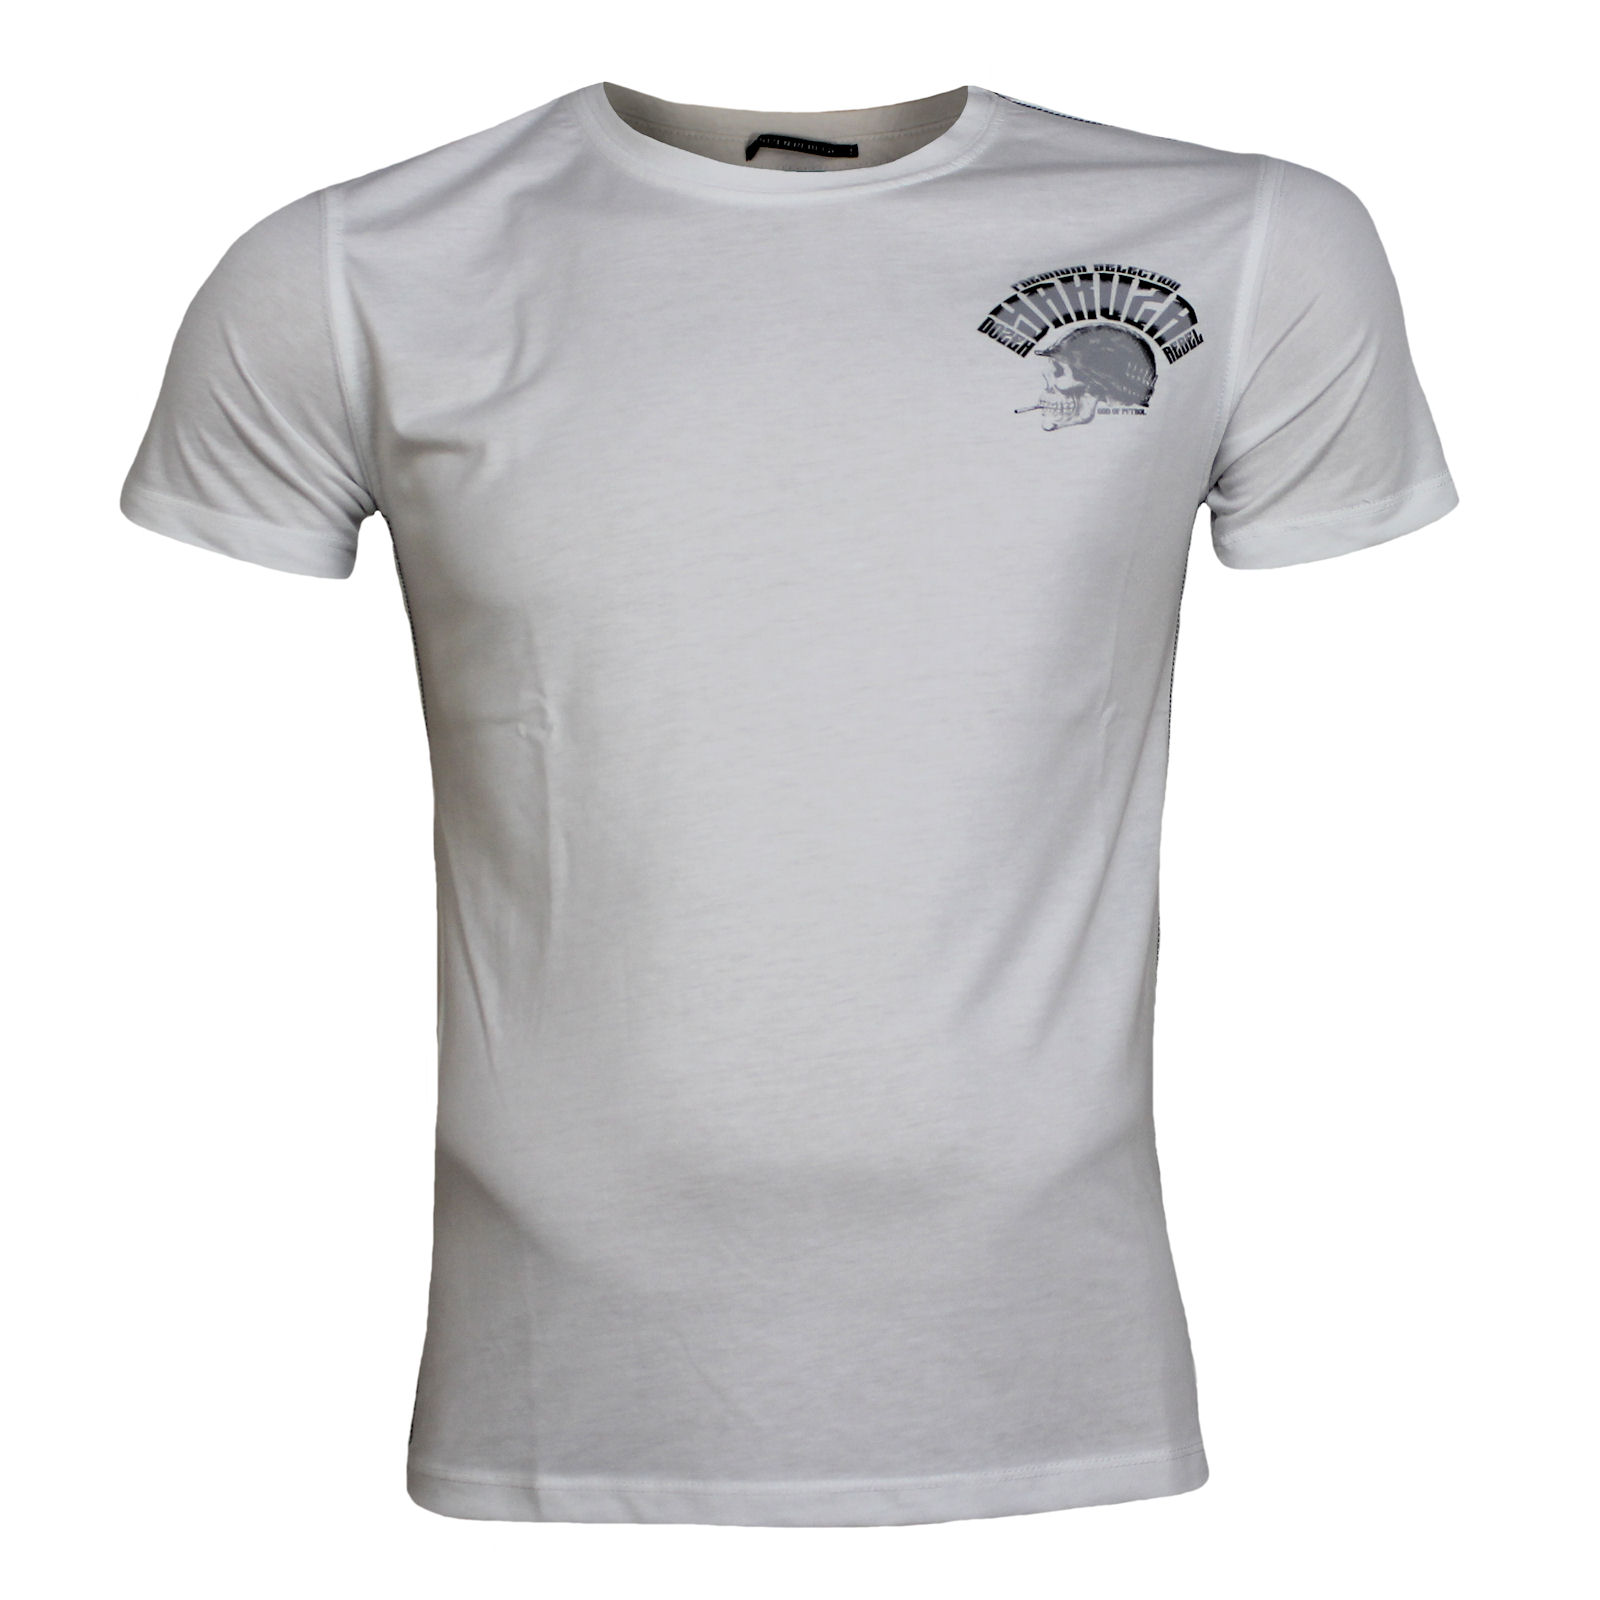 yakuza premium t shirt yps 2414 natur herren t shirts. Black Bedroom Furniture Sets. Home Design Ideas